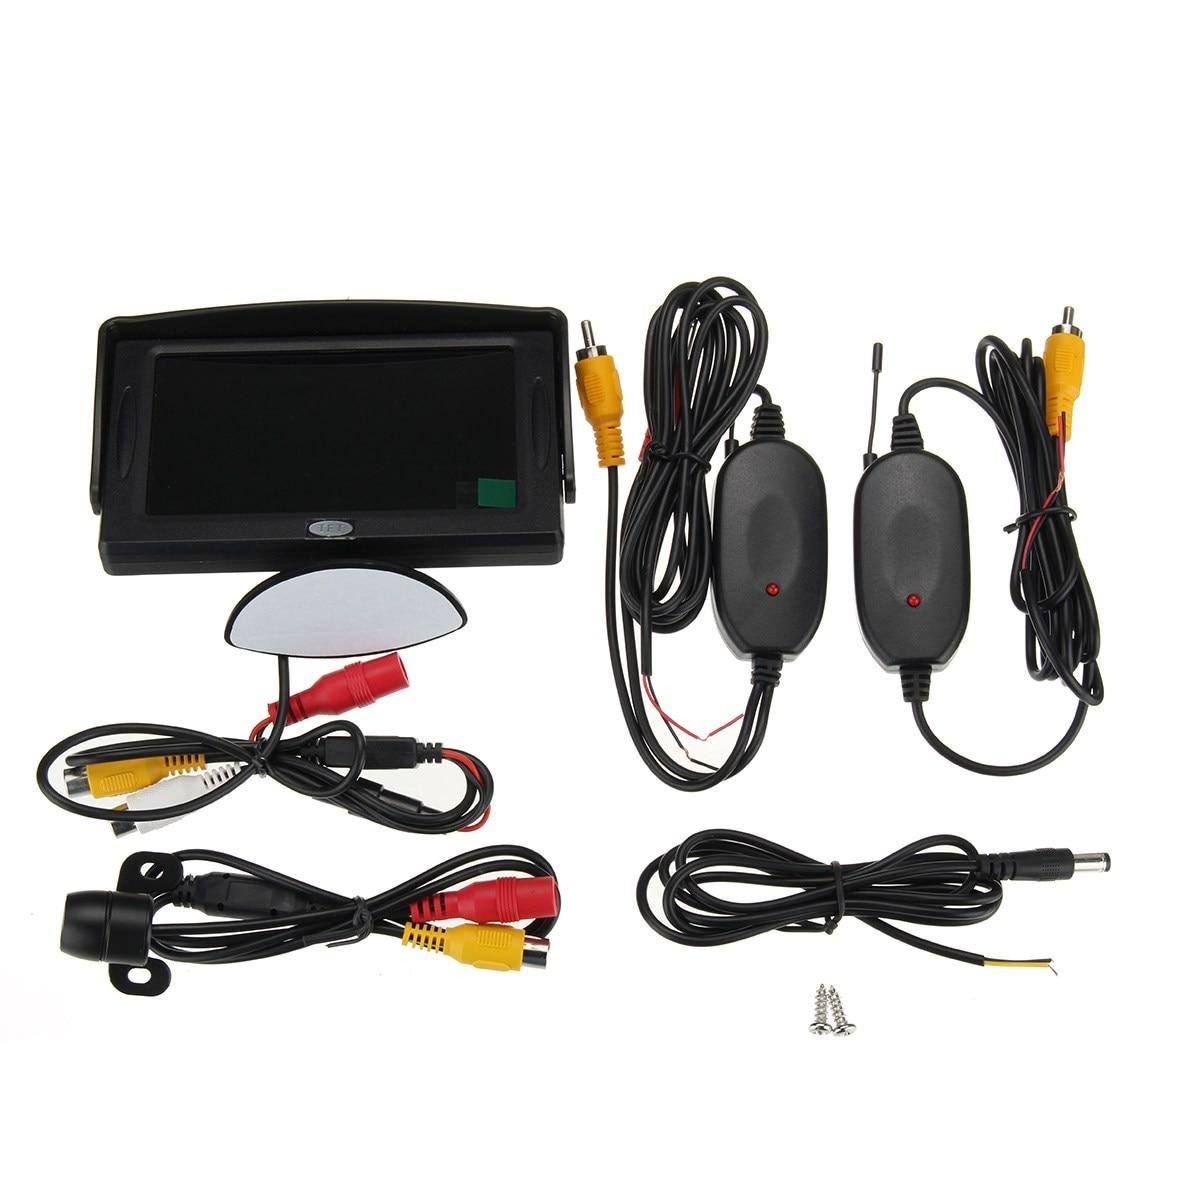 Wireless 120 Degree Car Rear View Backup Reverse Camera 4.3